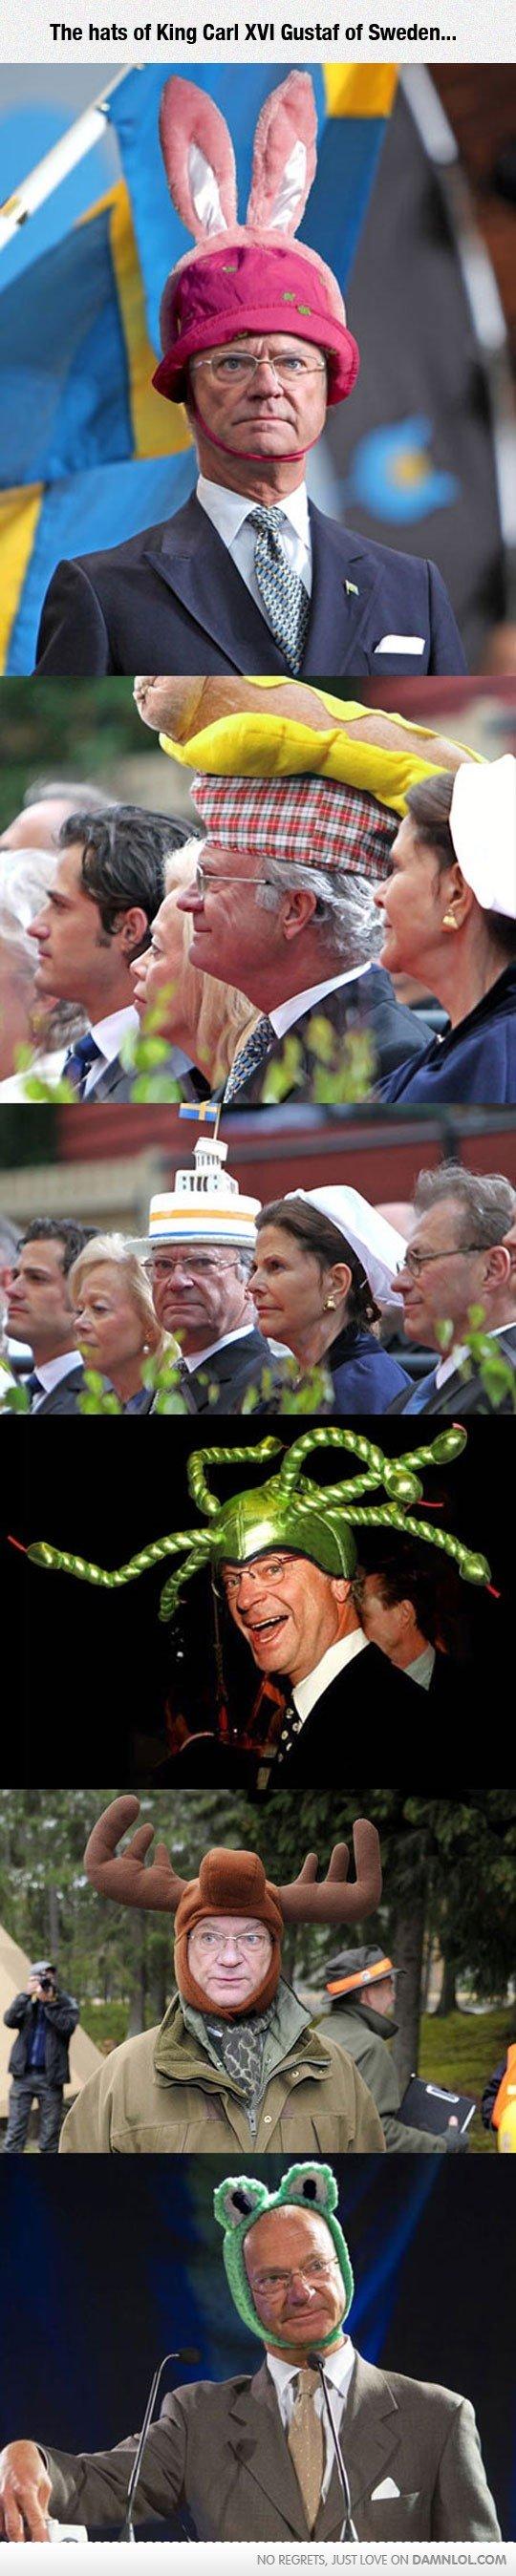 swetard. . The hats of King Earl XVI Gustaf {If Sweden...